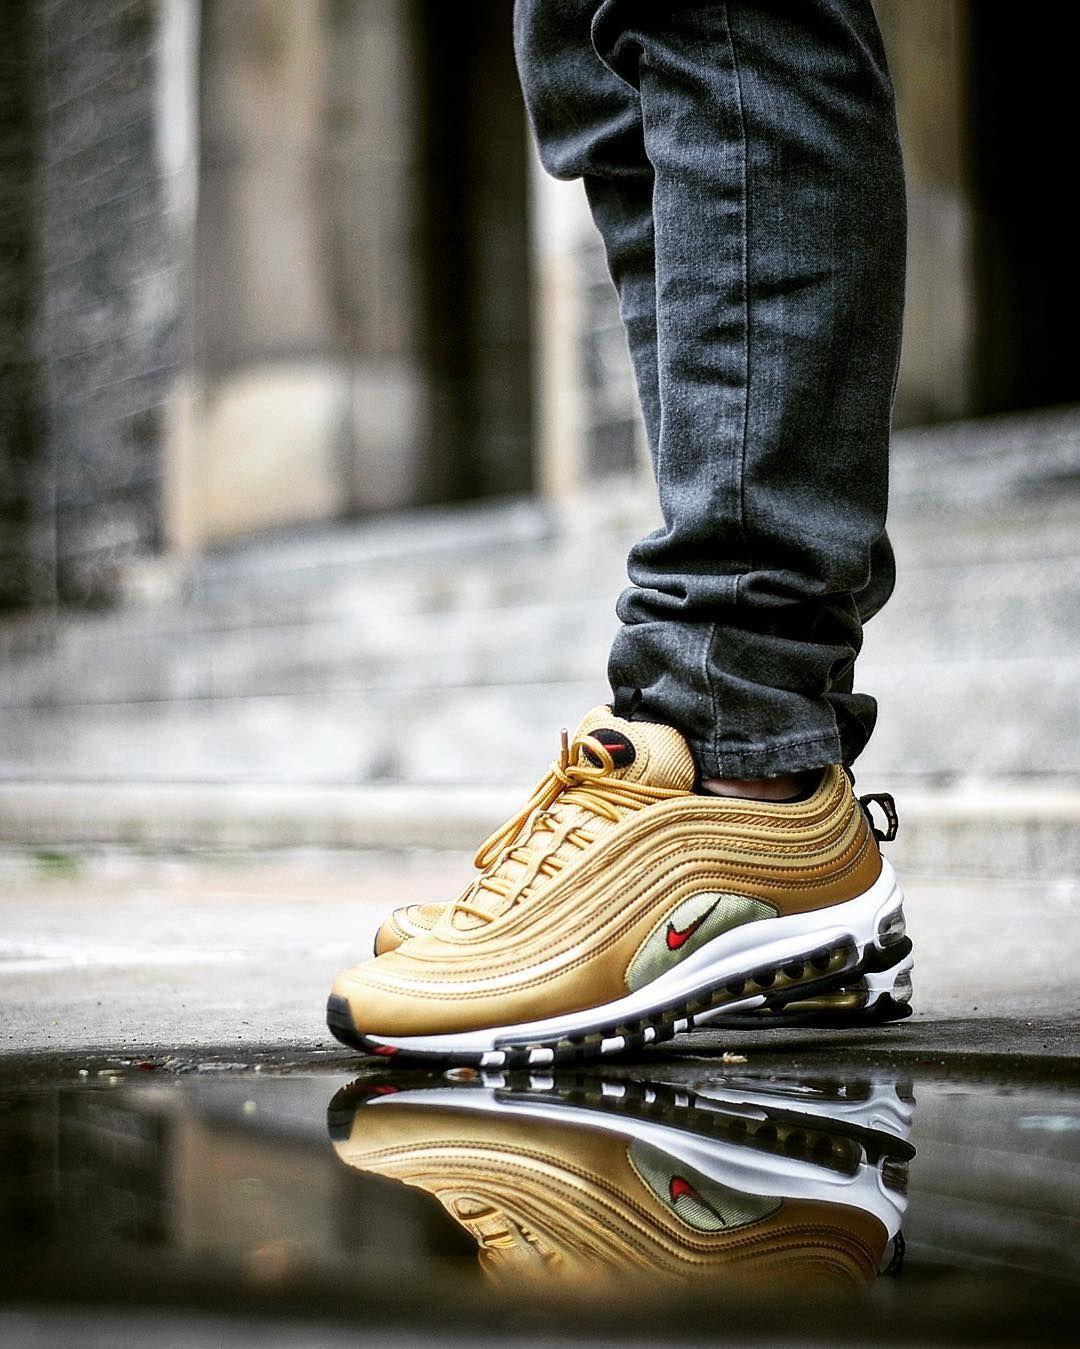 Nike Air Max 97 Og Qs Metallic Gold Women Sport Sneakers Nike Air Max 97 Running Shoes For Men